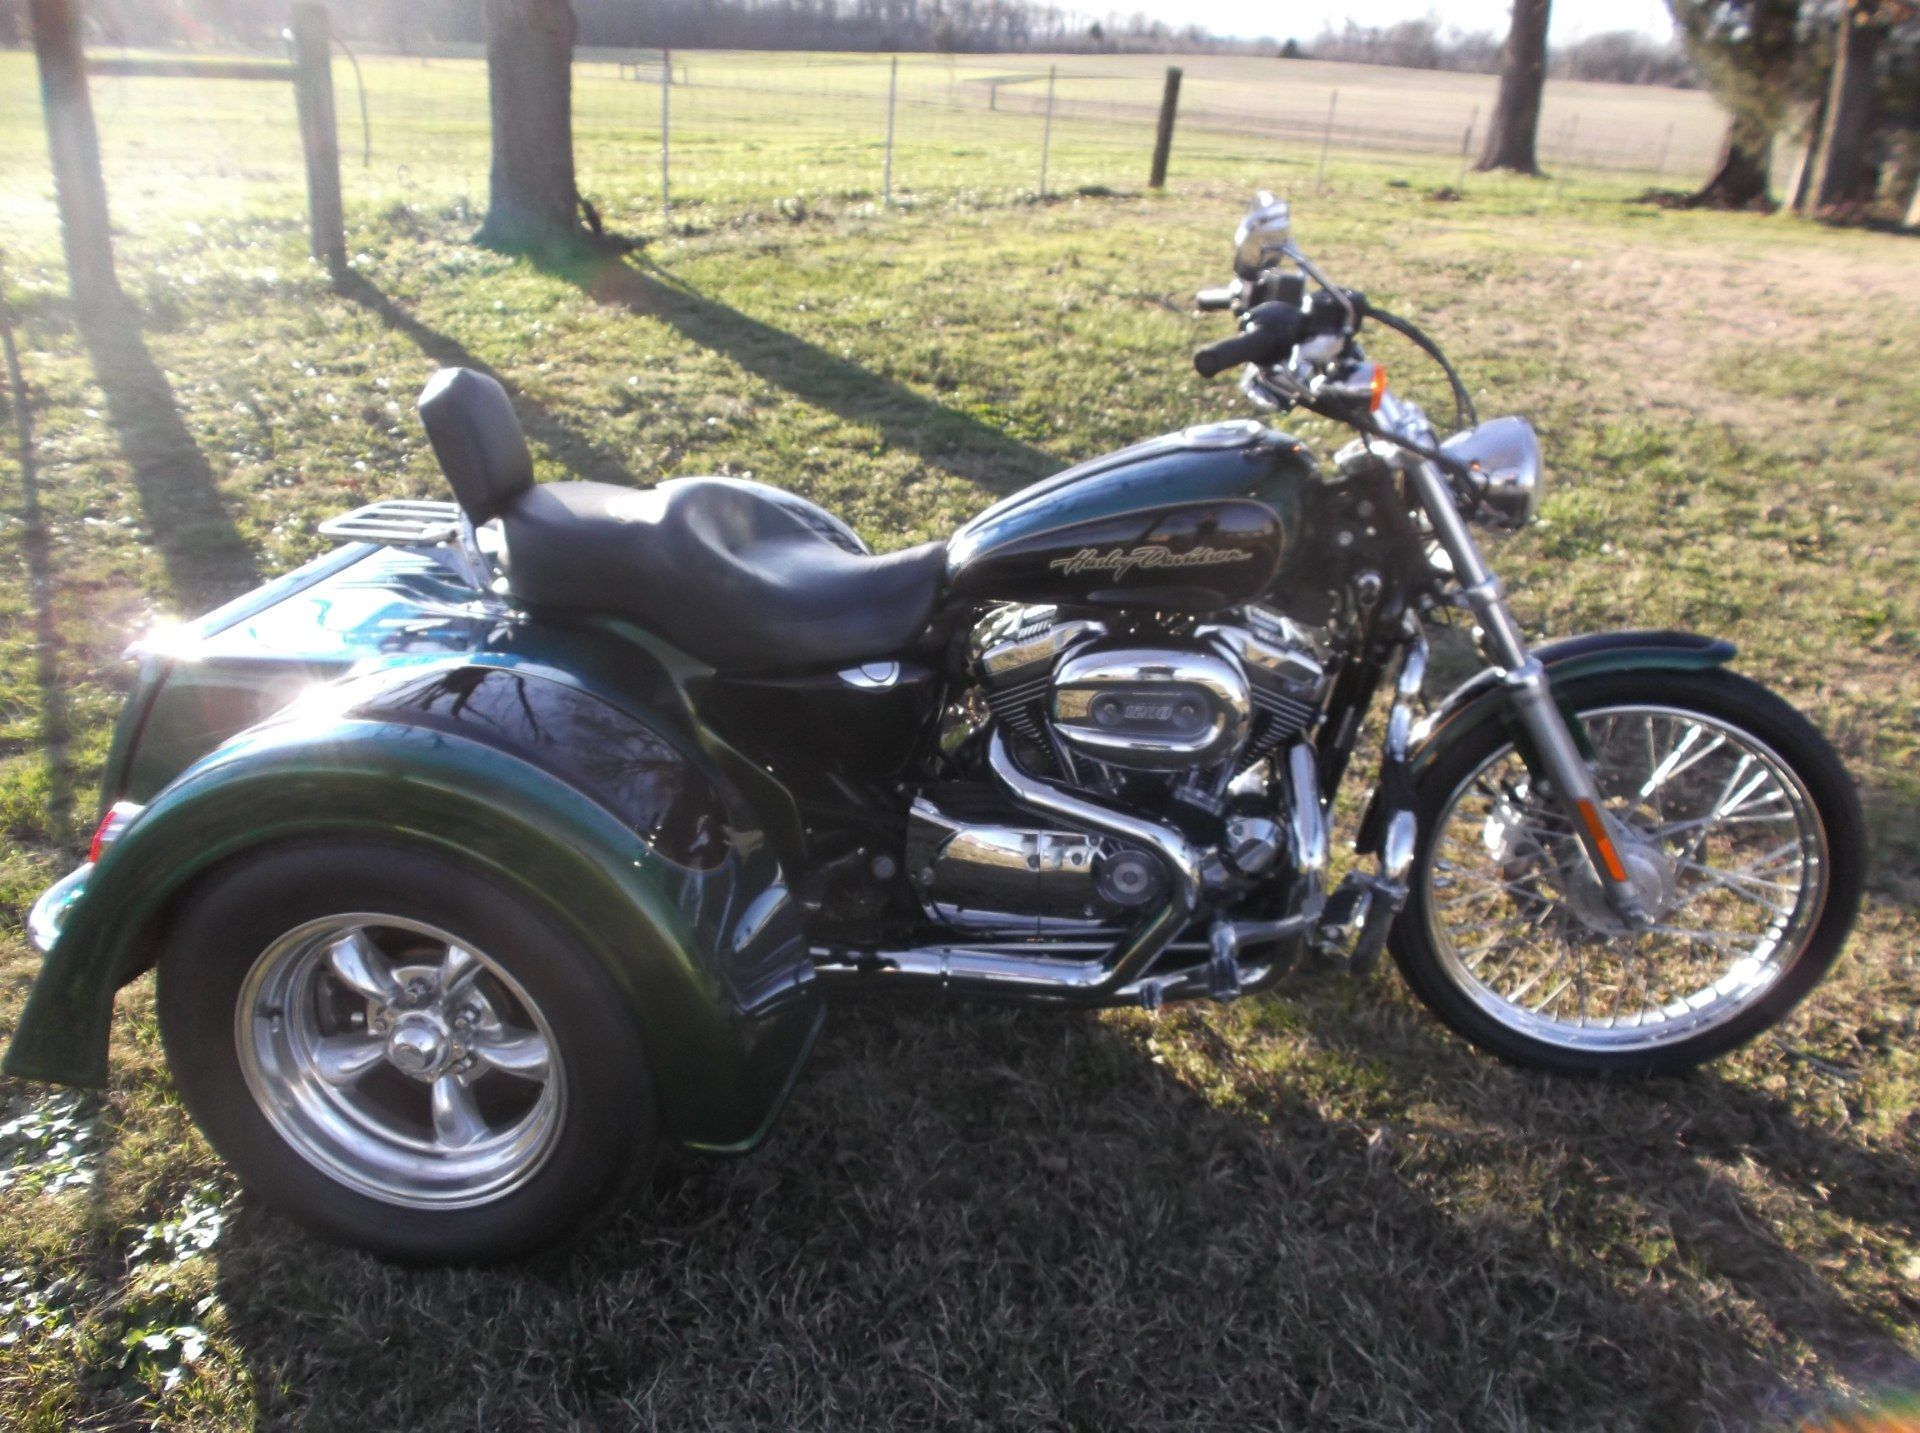 2006 Harley-Davidson XL1200 MOTORTRIKE 4